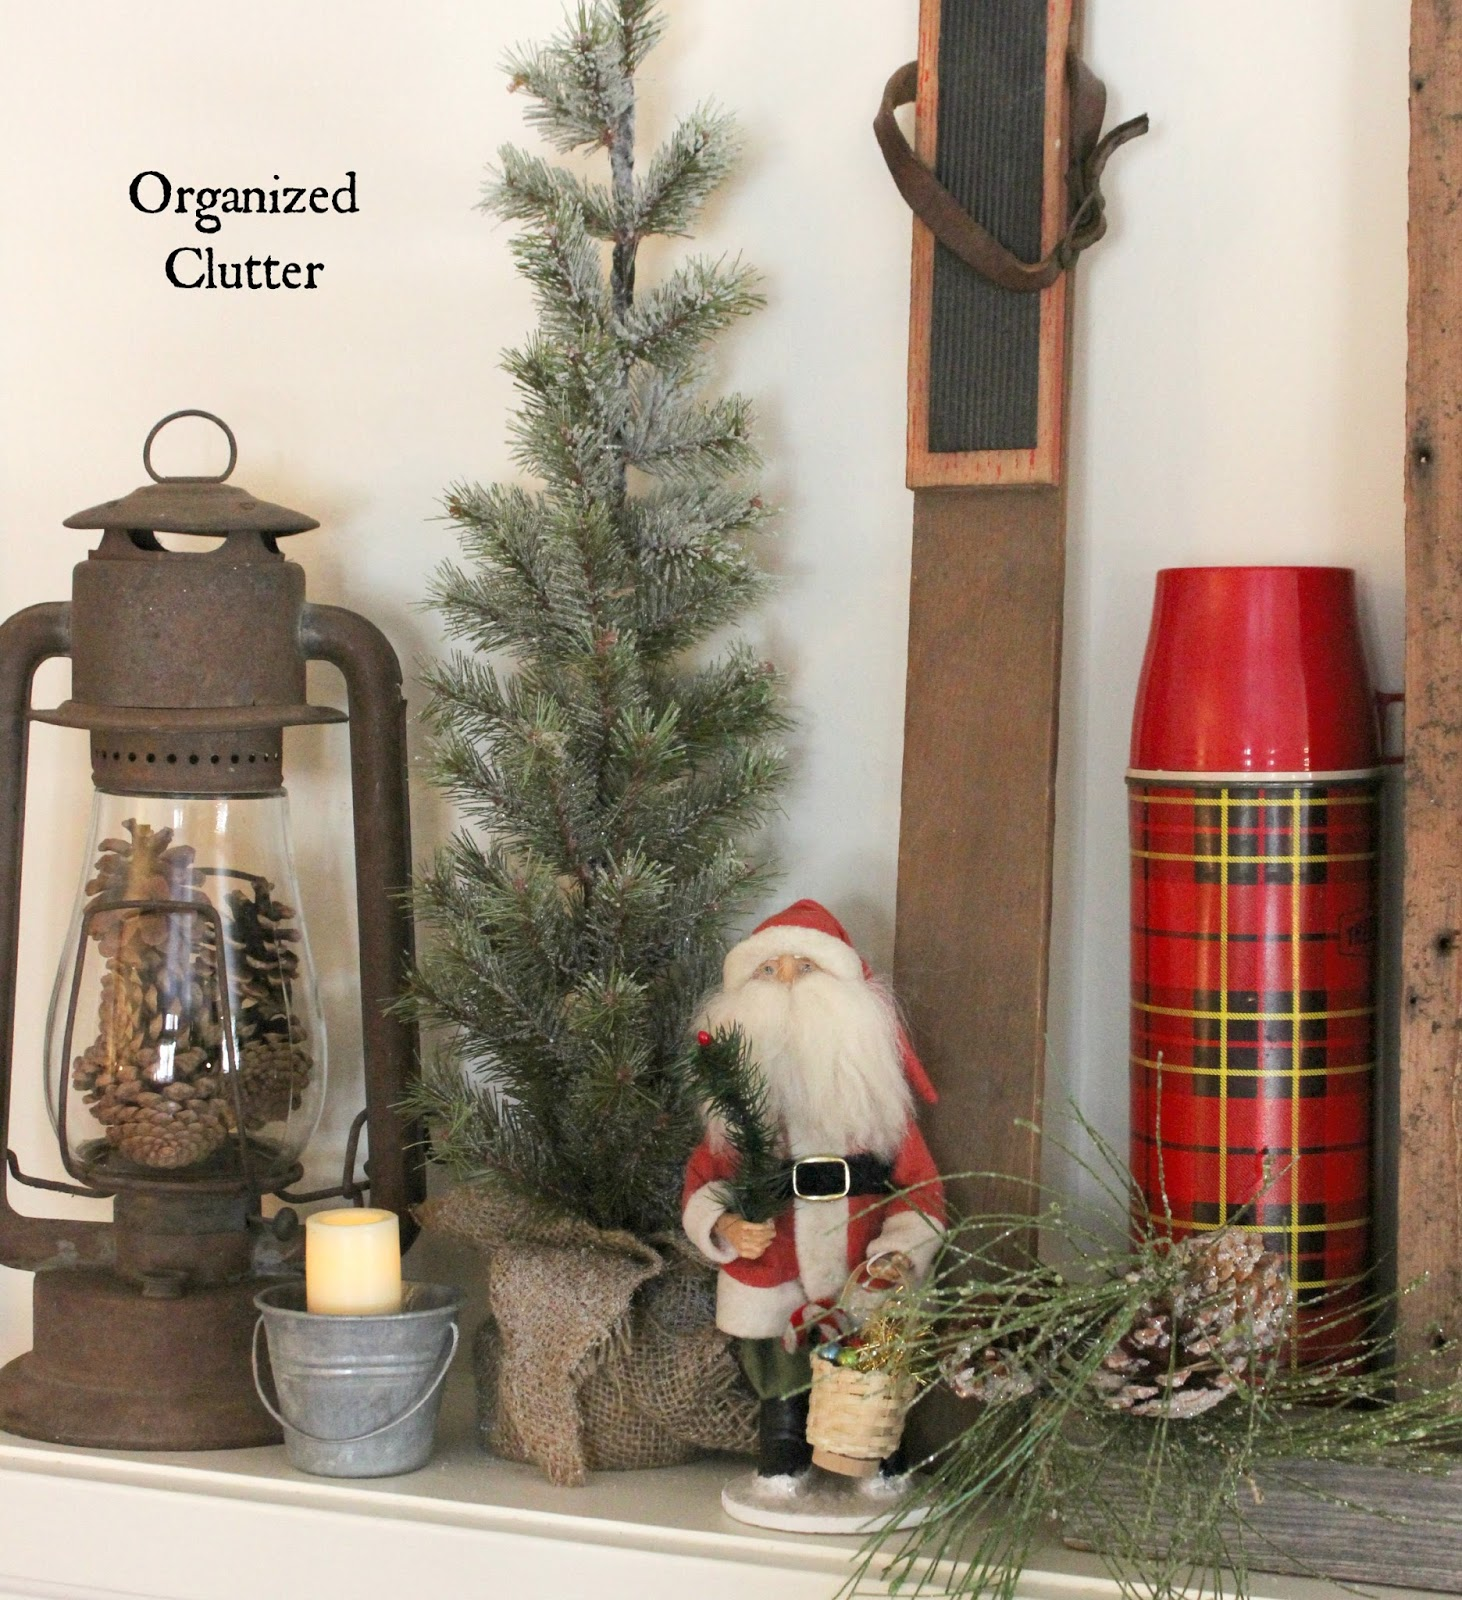 Winter Wonderland Christmas Mantel 2015 Organized Clutter